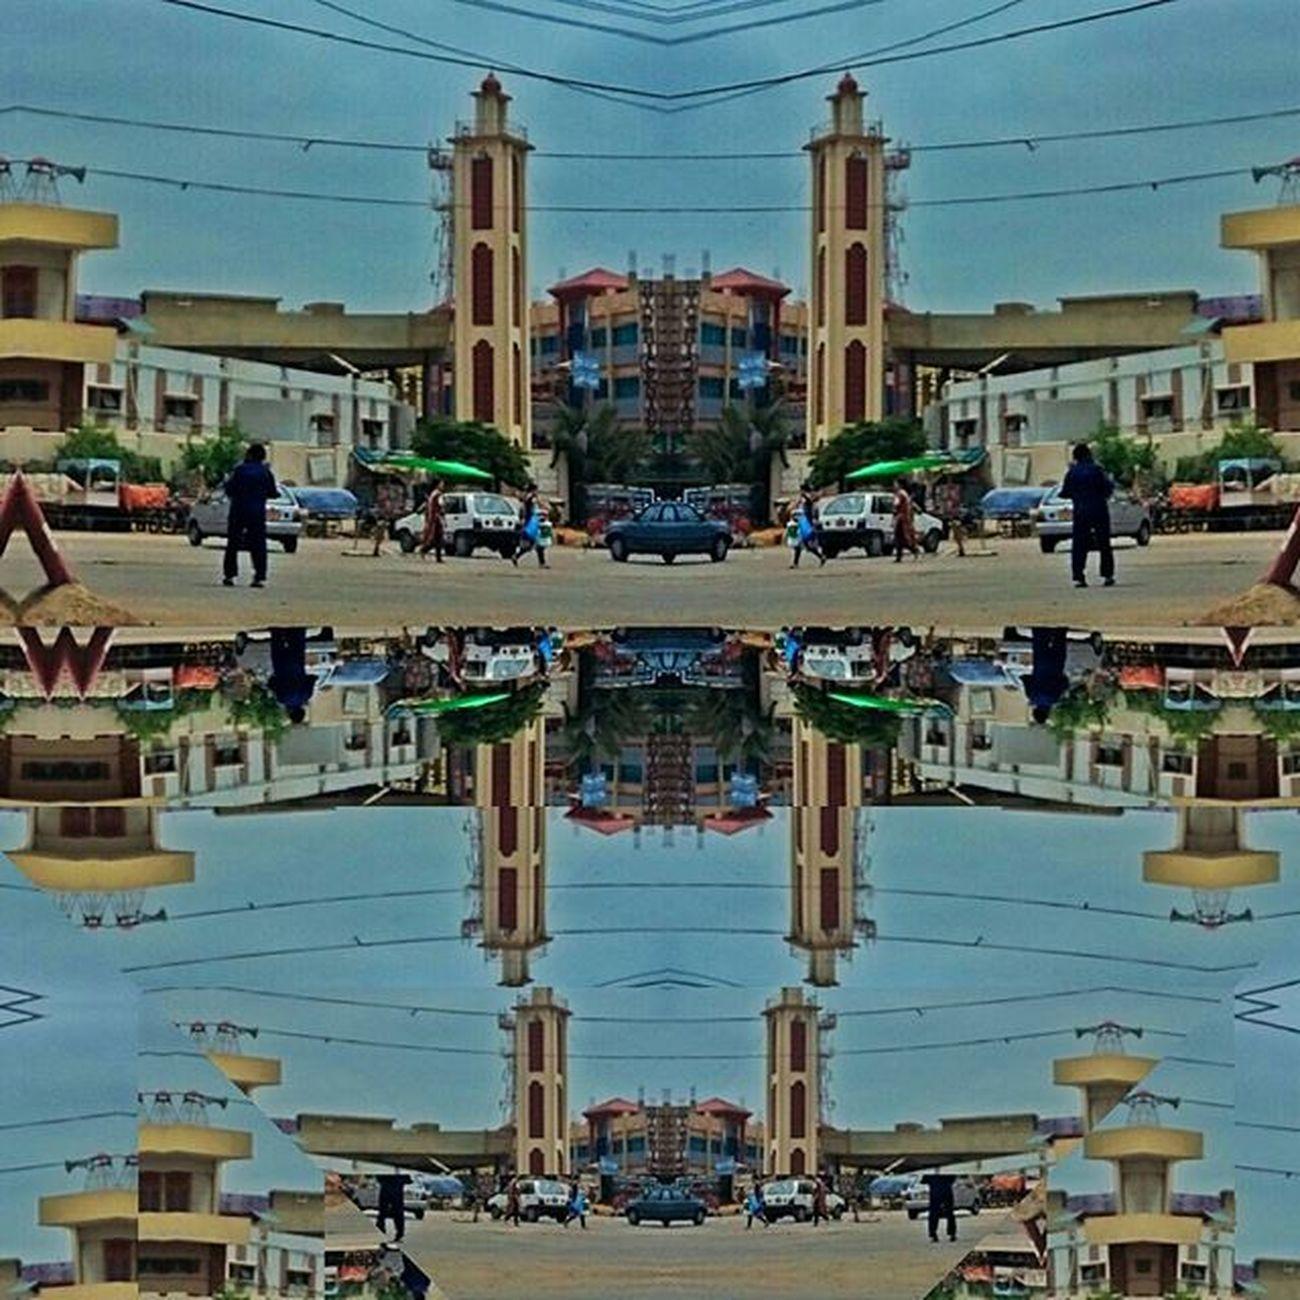 Trippyseriesbyaimy Karachi Pakistan Street Instagood Patchwork Nature Green Sunset Abstract Art Abstractart Abstracters_anonymous Abstract_buff Abstraction Instagood Creative Artsy Beautiful Photooftheday Abstracto StayABSTRACT Instaabstract Aimanadeel